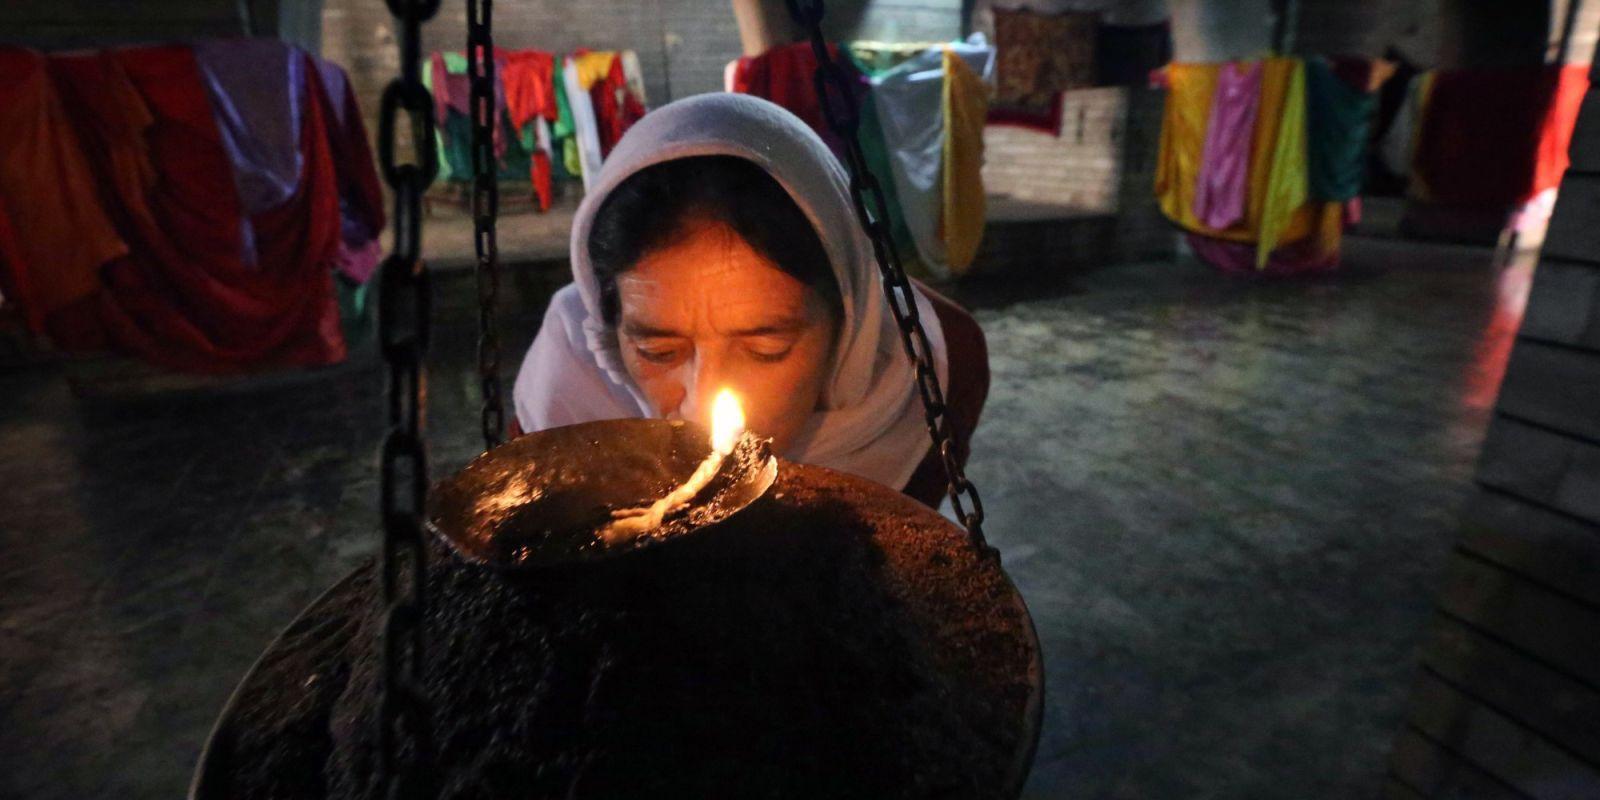 IRAQ-CONFLICT-RELIGION-YAZIDI